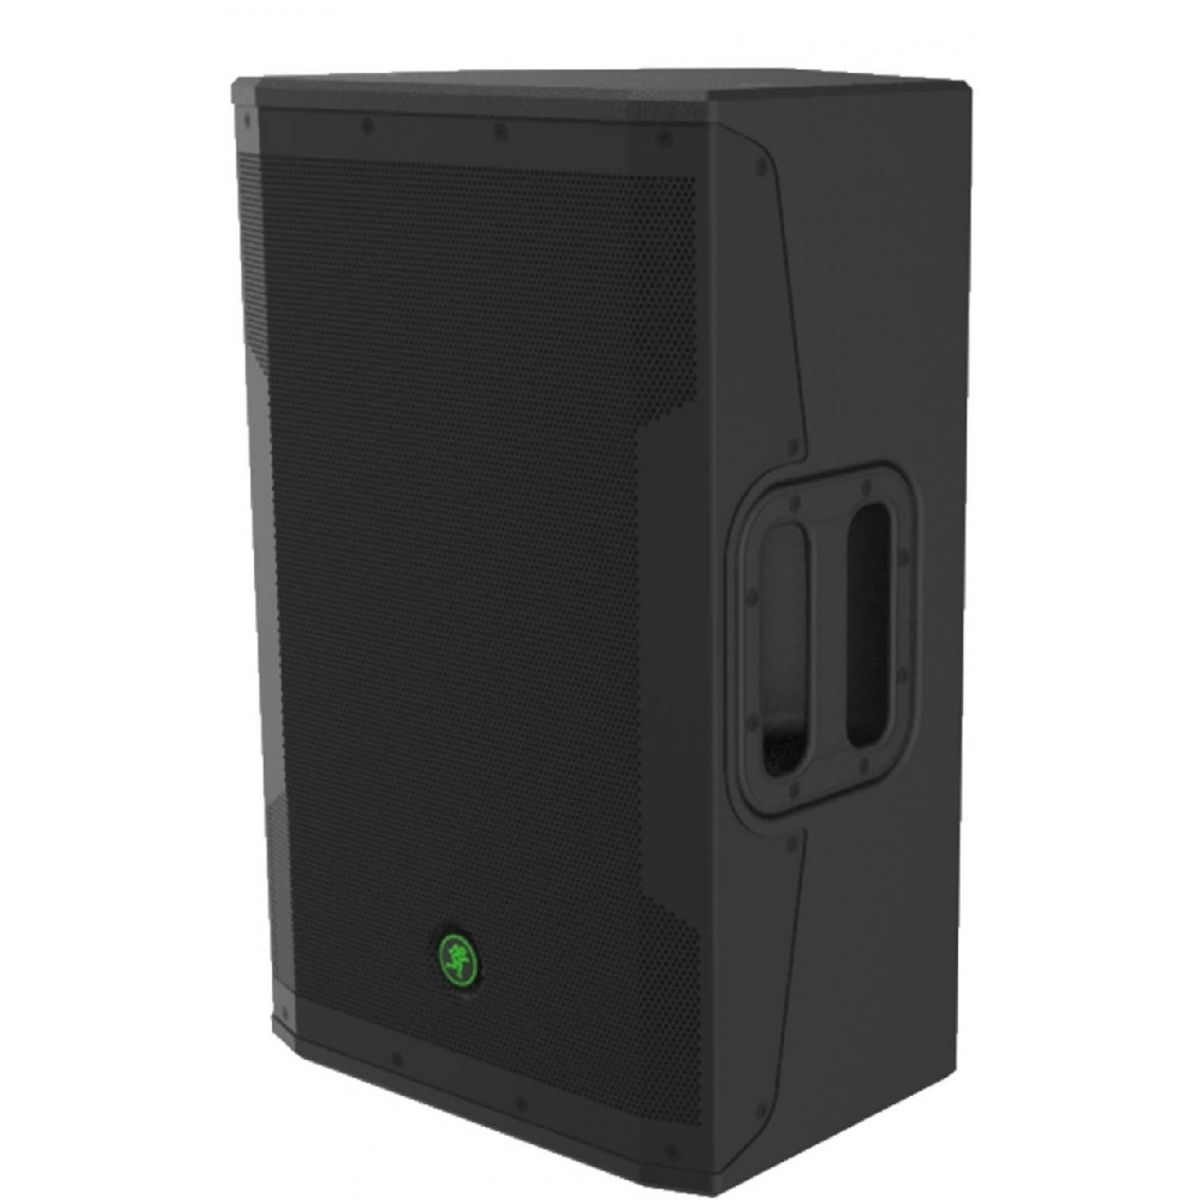 Caixa Som Ativa Mackie 12 Srm 550 1600w Bi-Amplificada